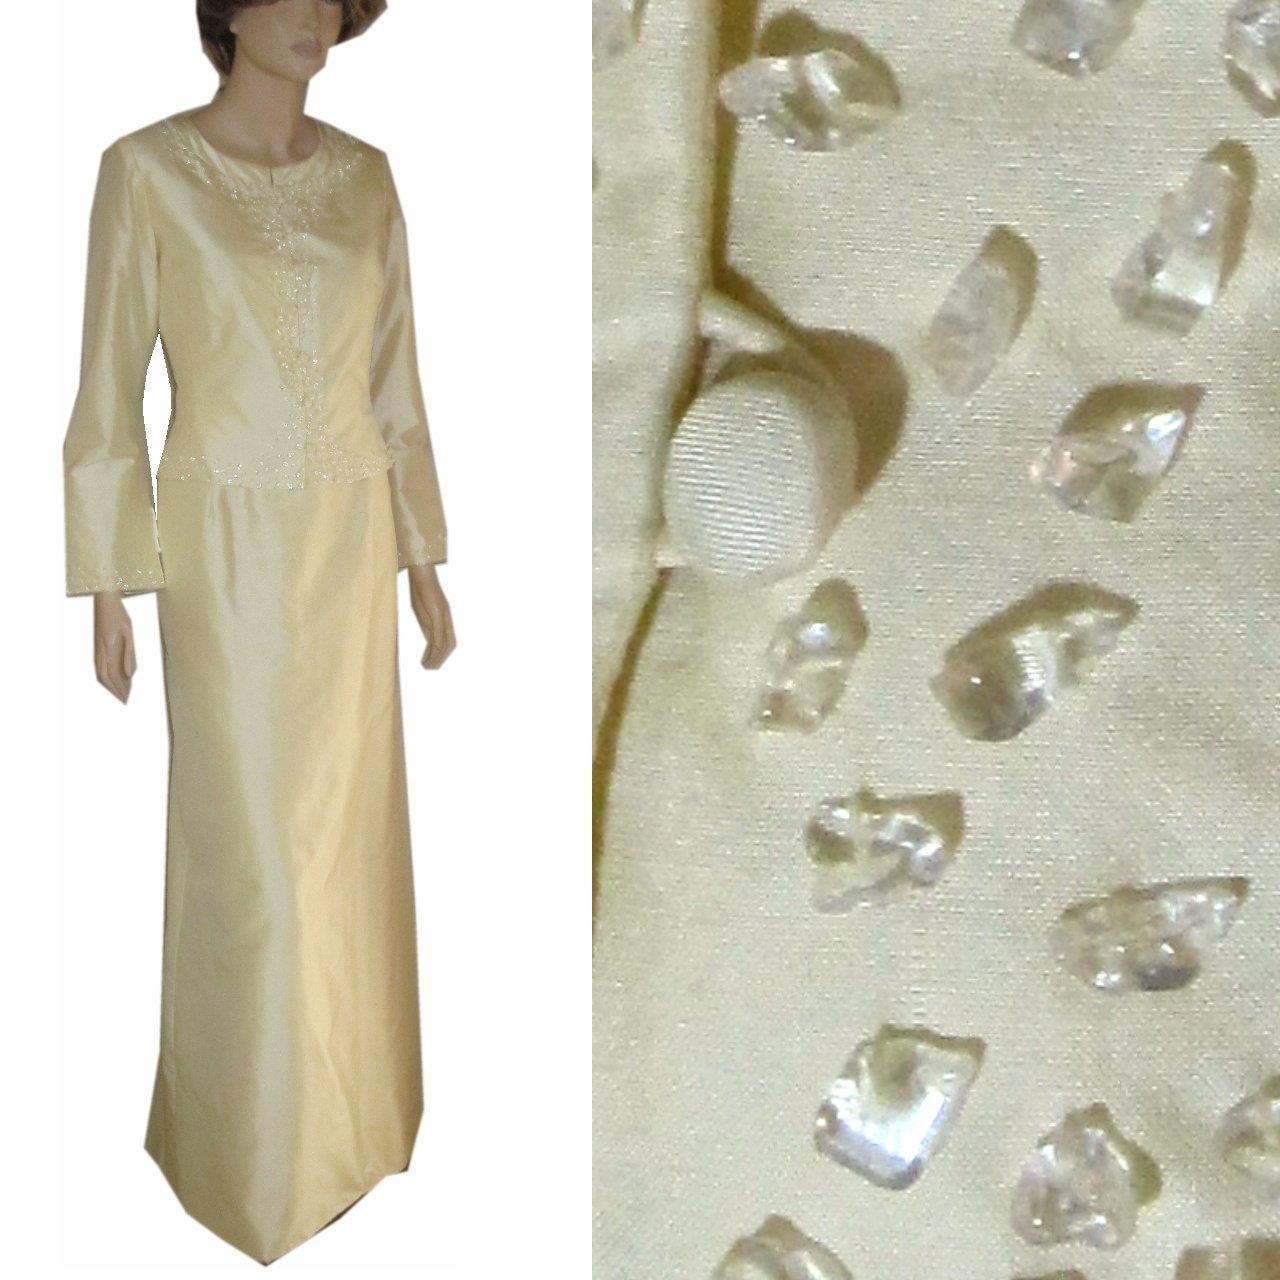 sz 8 MARISA BARATELLI Vanilla Silk Formal Suit $169.99 - List PRice $886